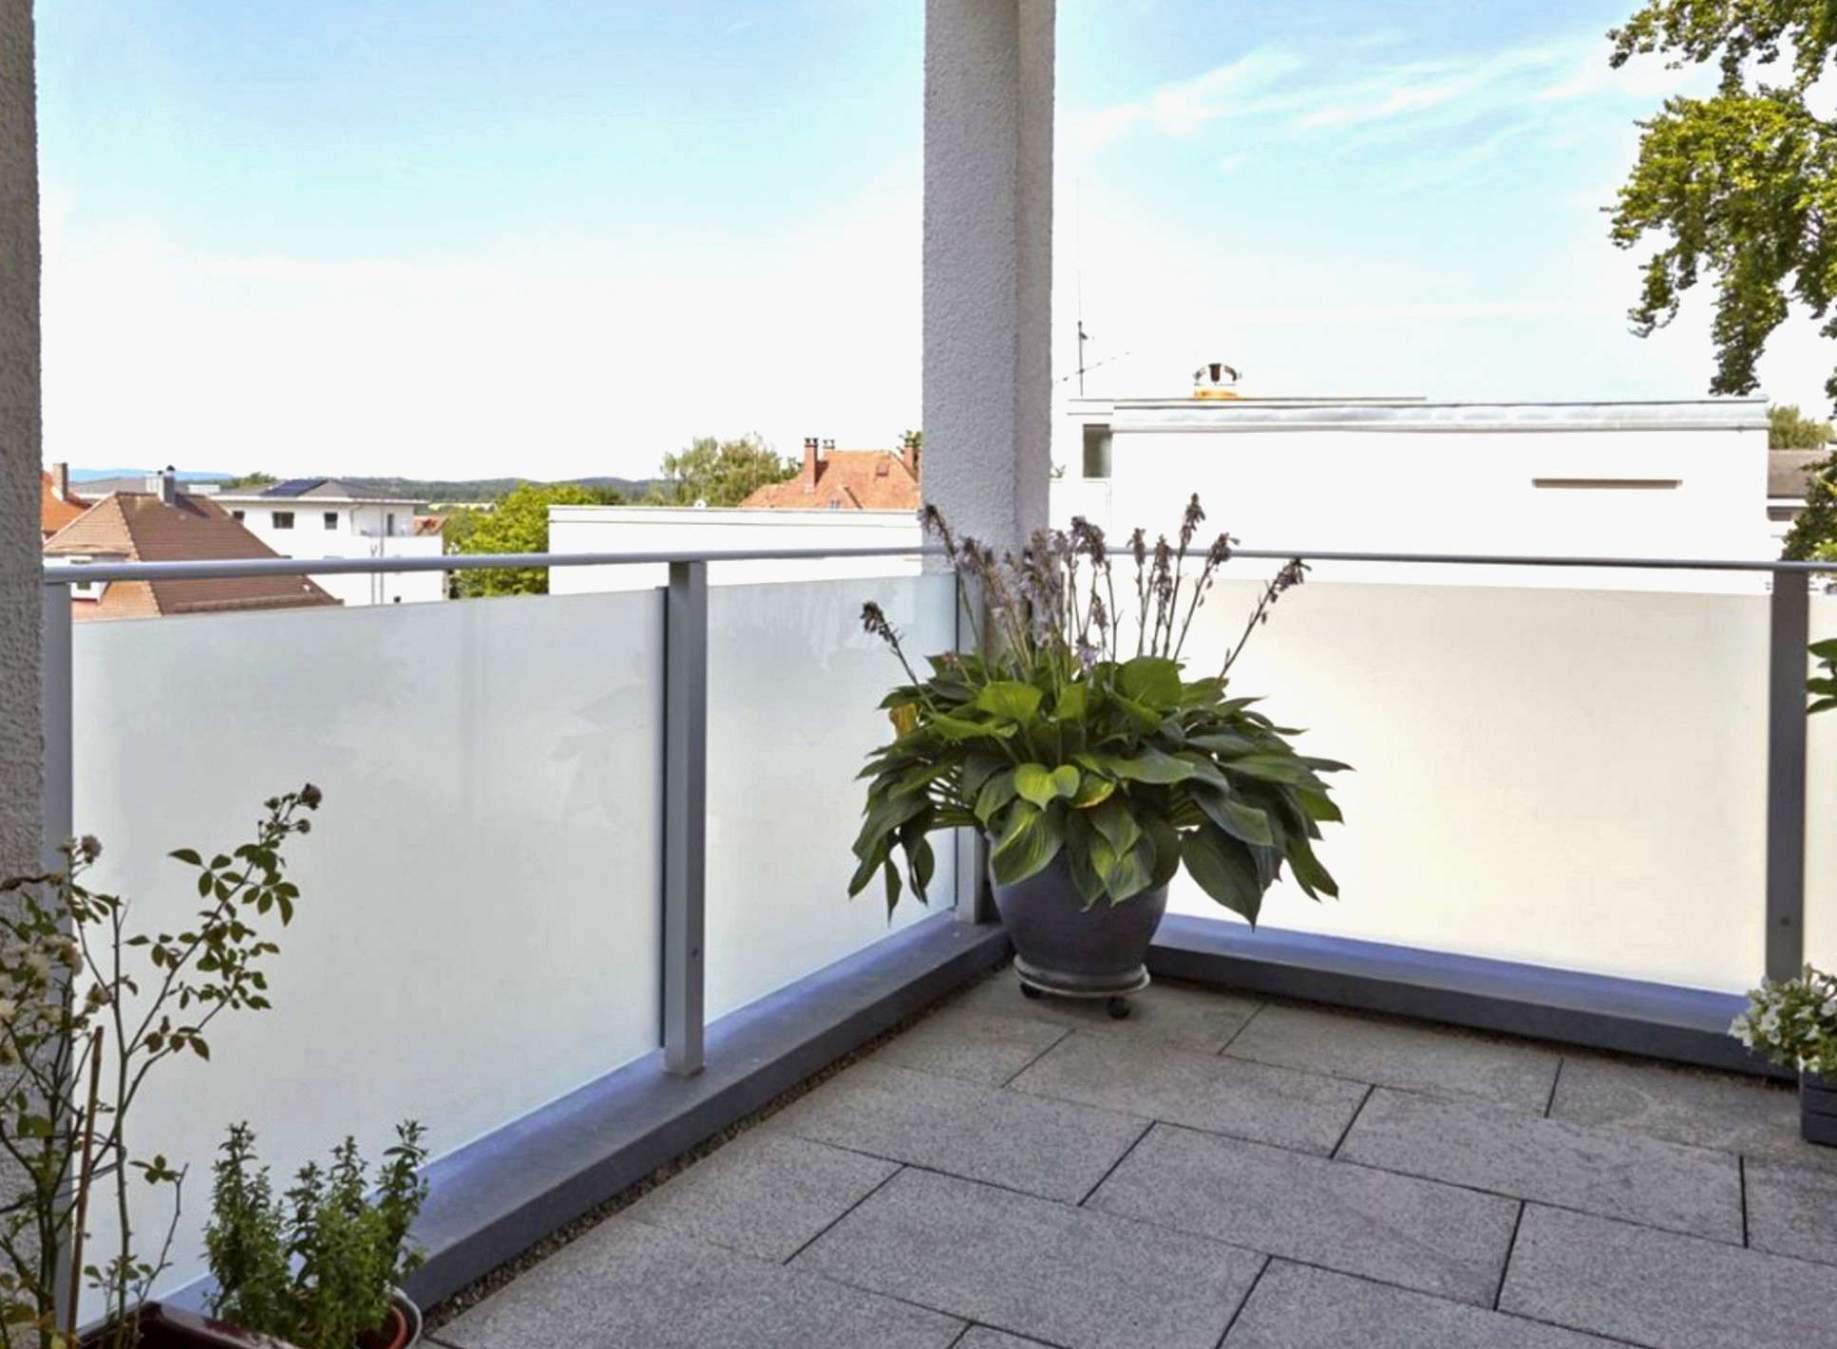 origineller sichtschutz garten genial moderne terrassen ideen temobardz home blog of origineller sichtschutz garten